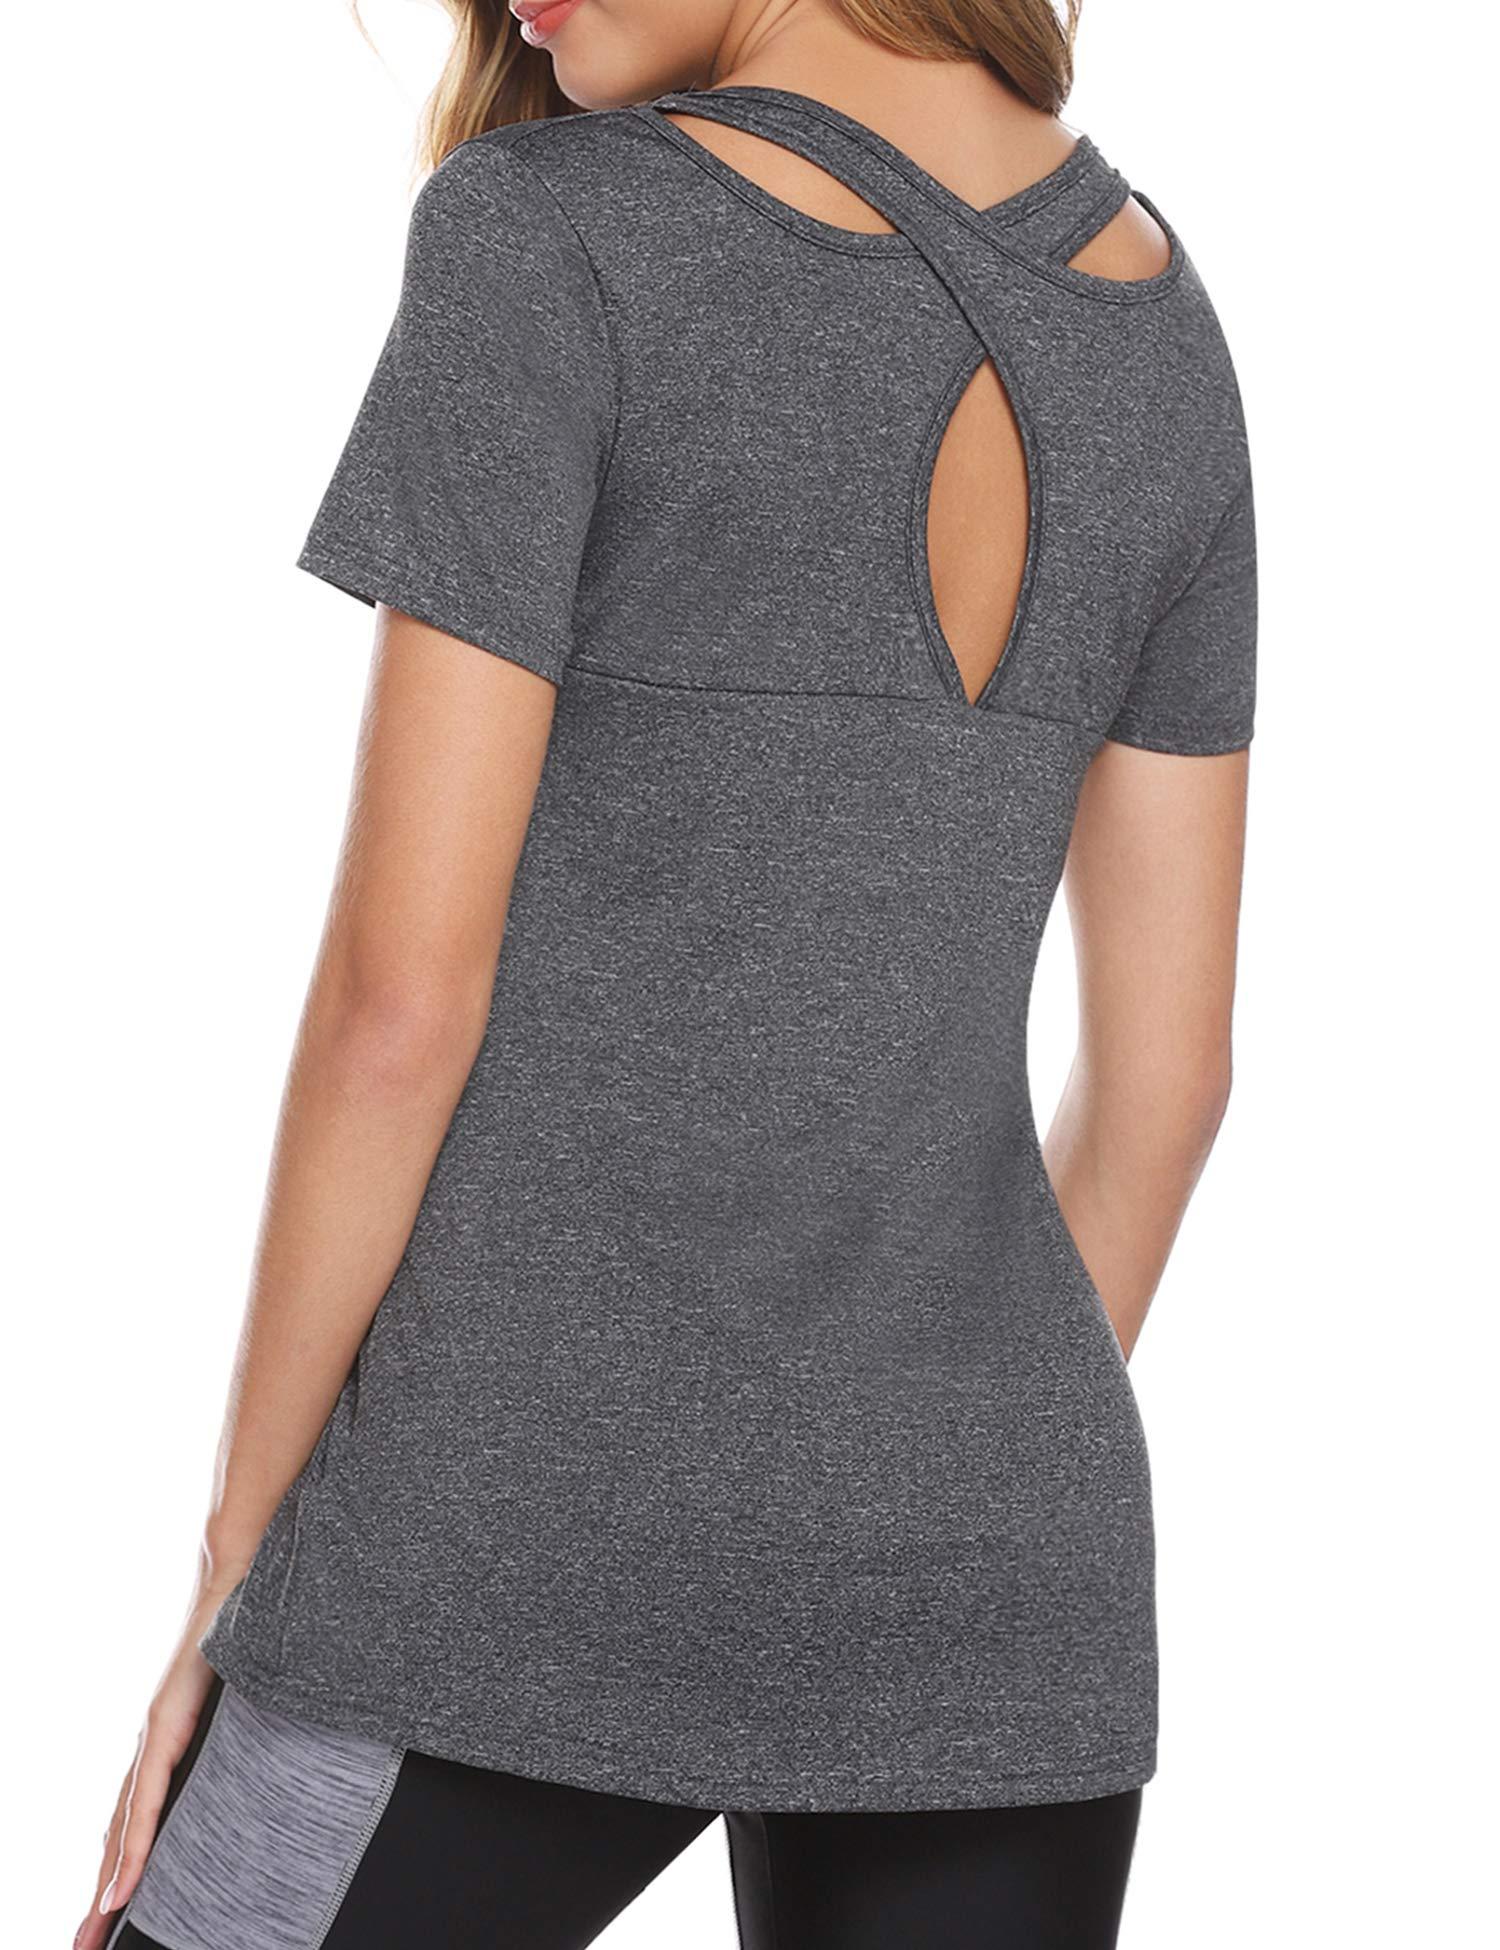 iClosam Women's Yoga Tops Short Sleeve Workout T-Shirt Tunic Top